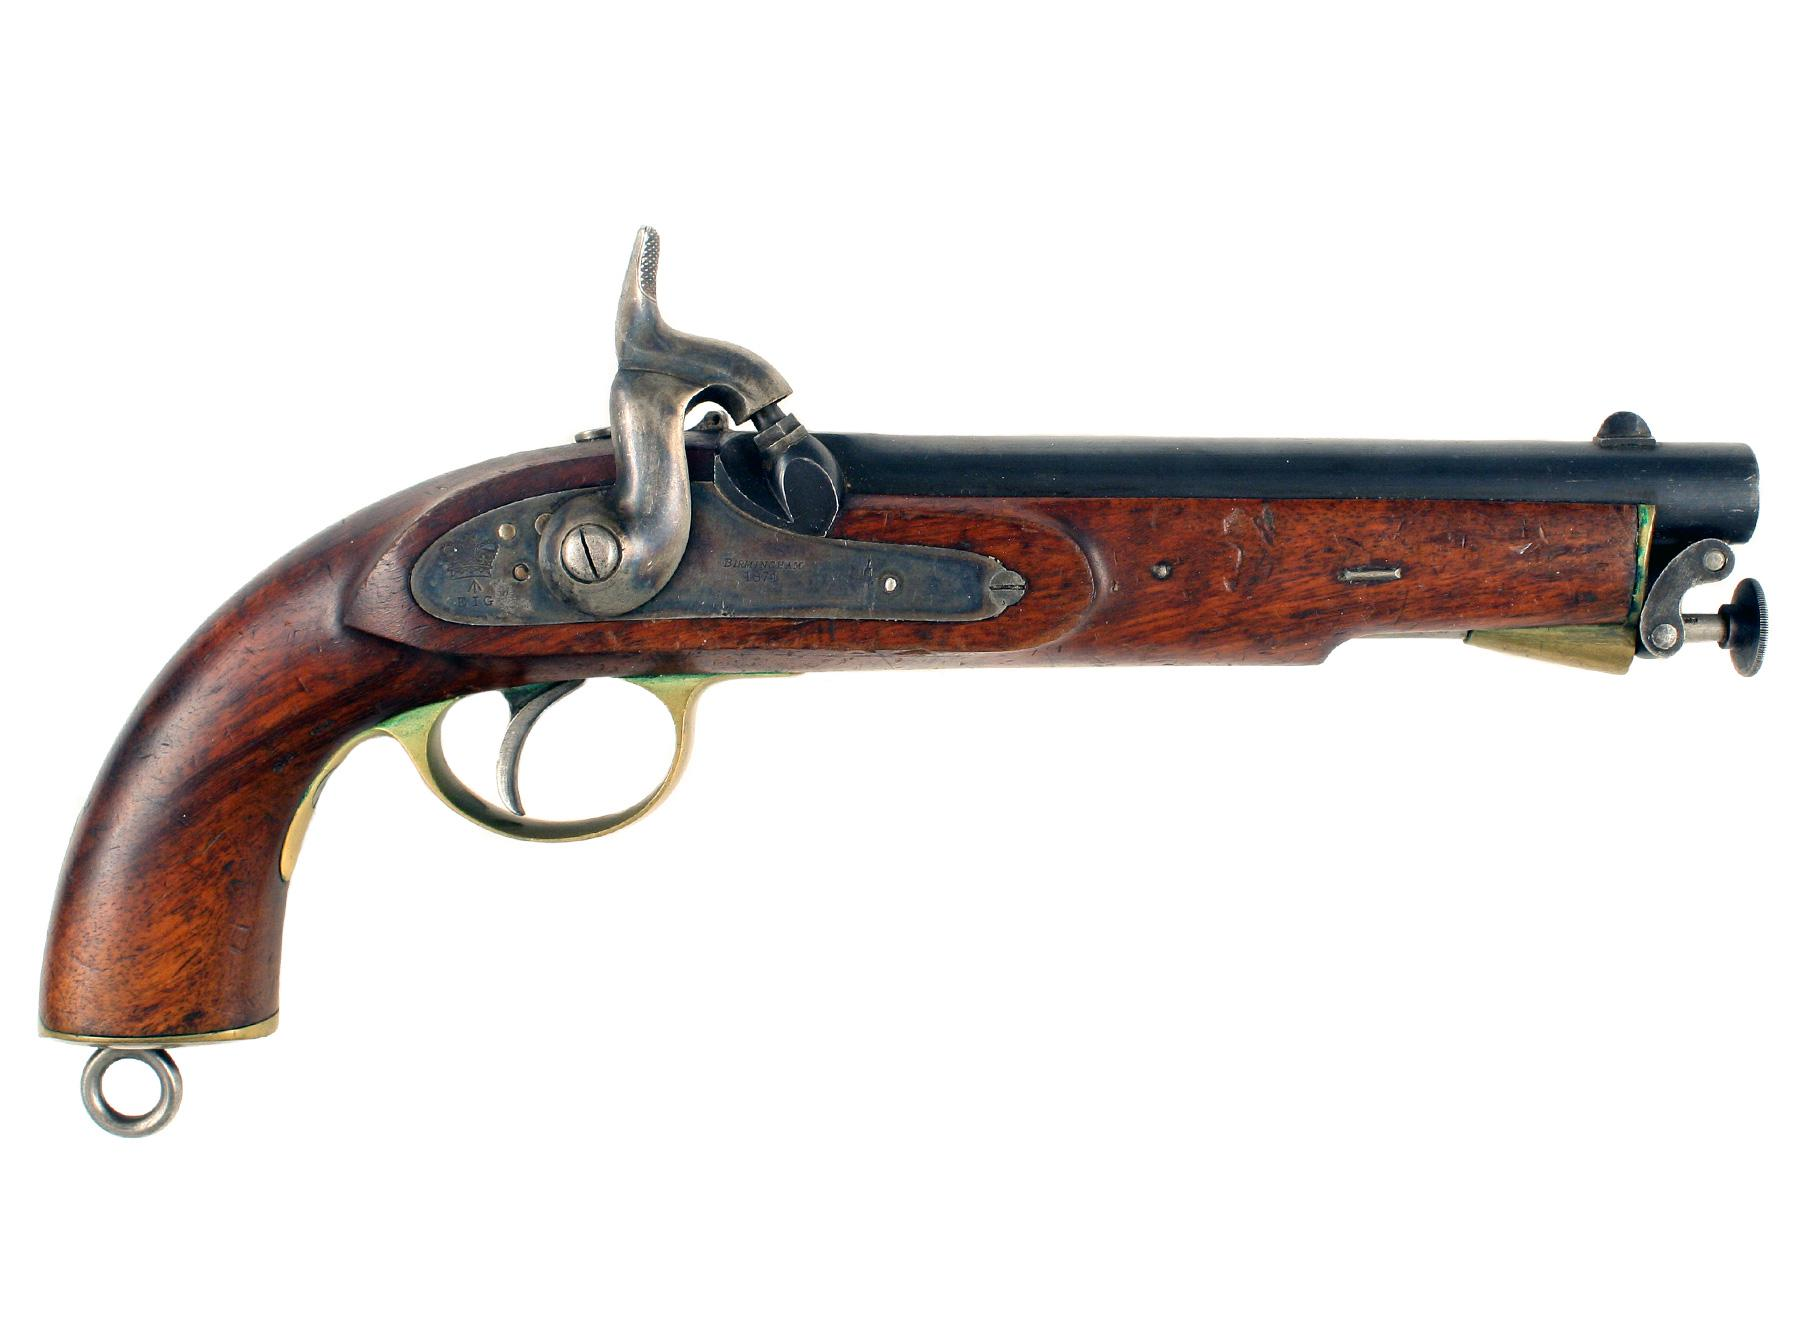 A Mint E.I.G. Percussion Pistol